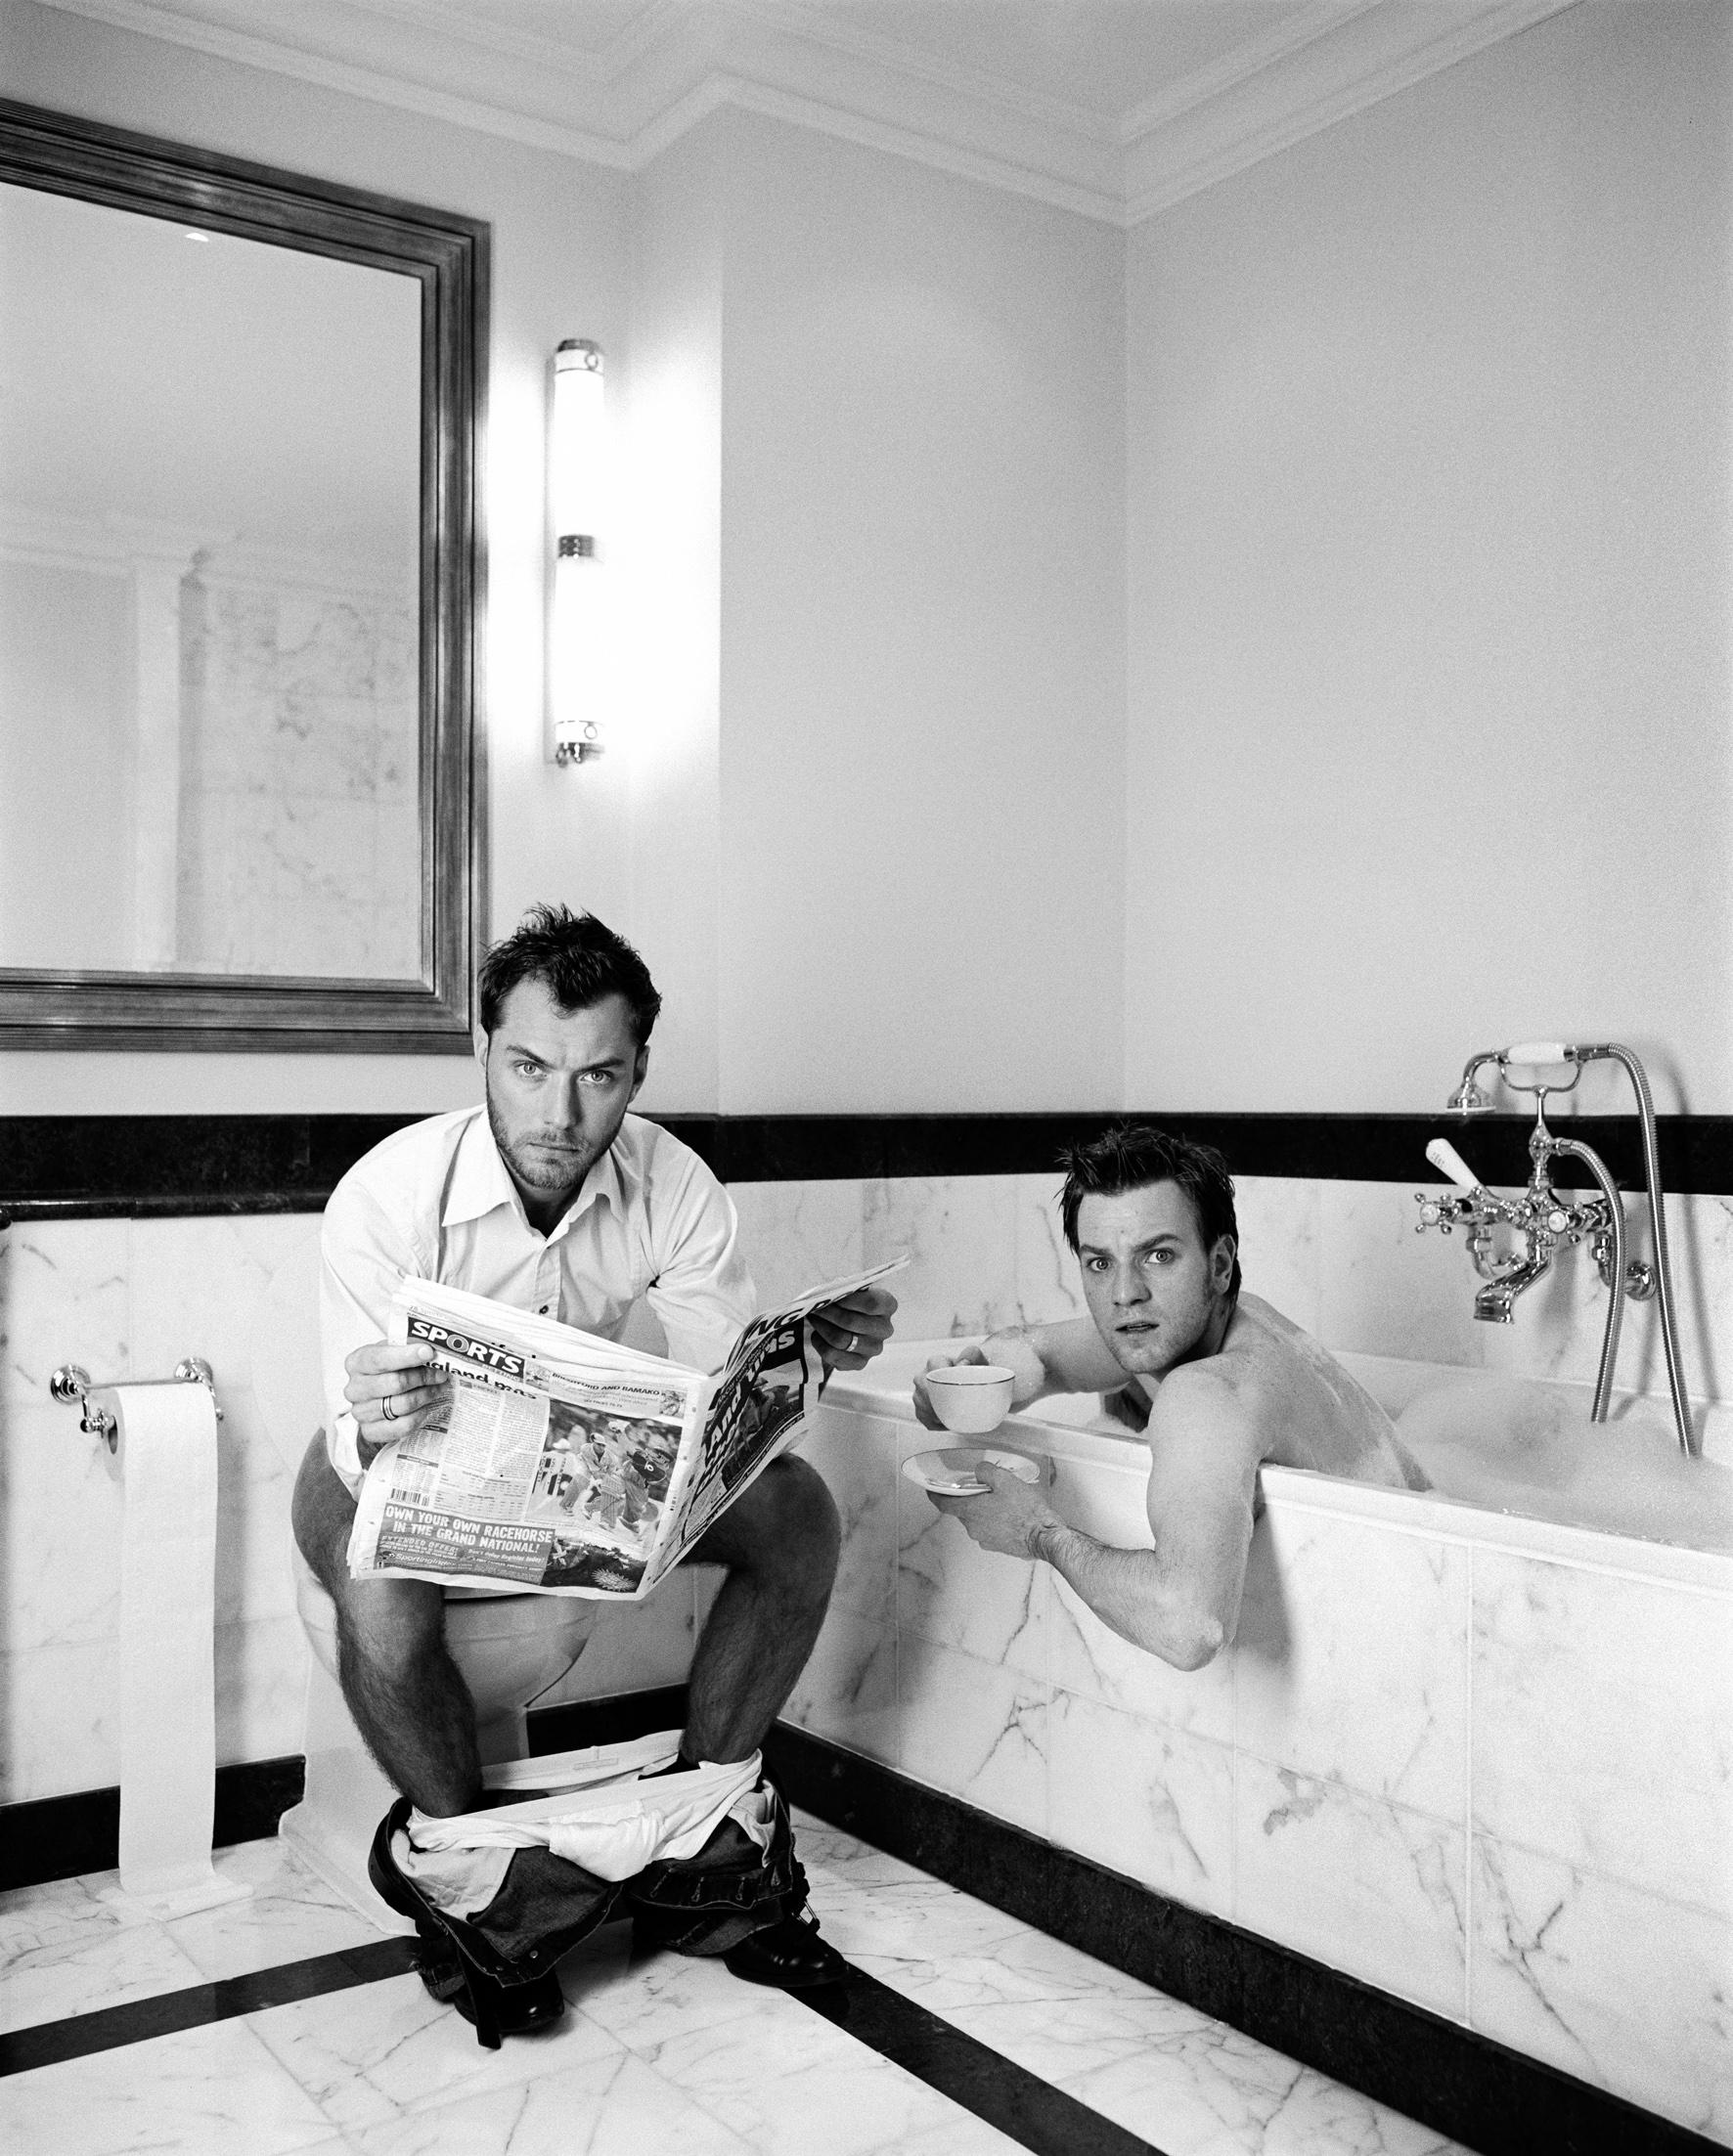 Lorenzo Agius, Jude and Ewan in the bathroom, 2003. Courtesy of Alon Zakaim Fine Art and the artist